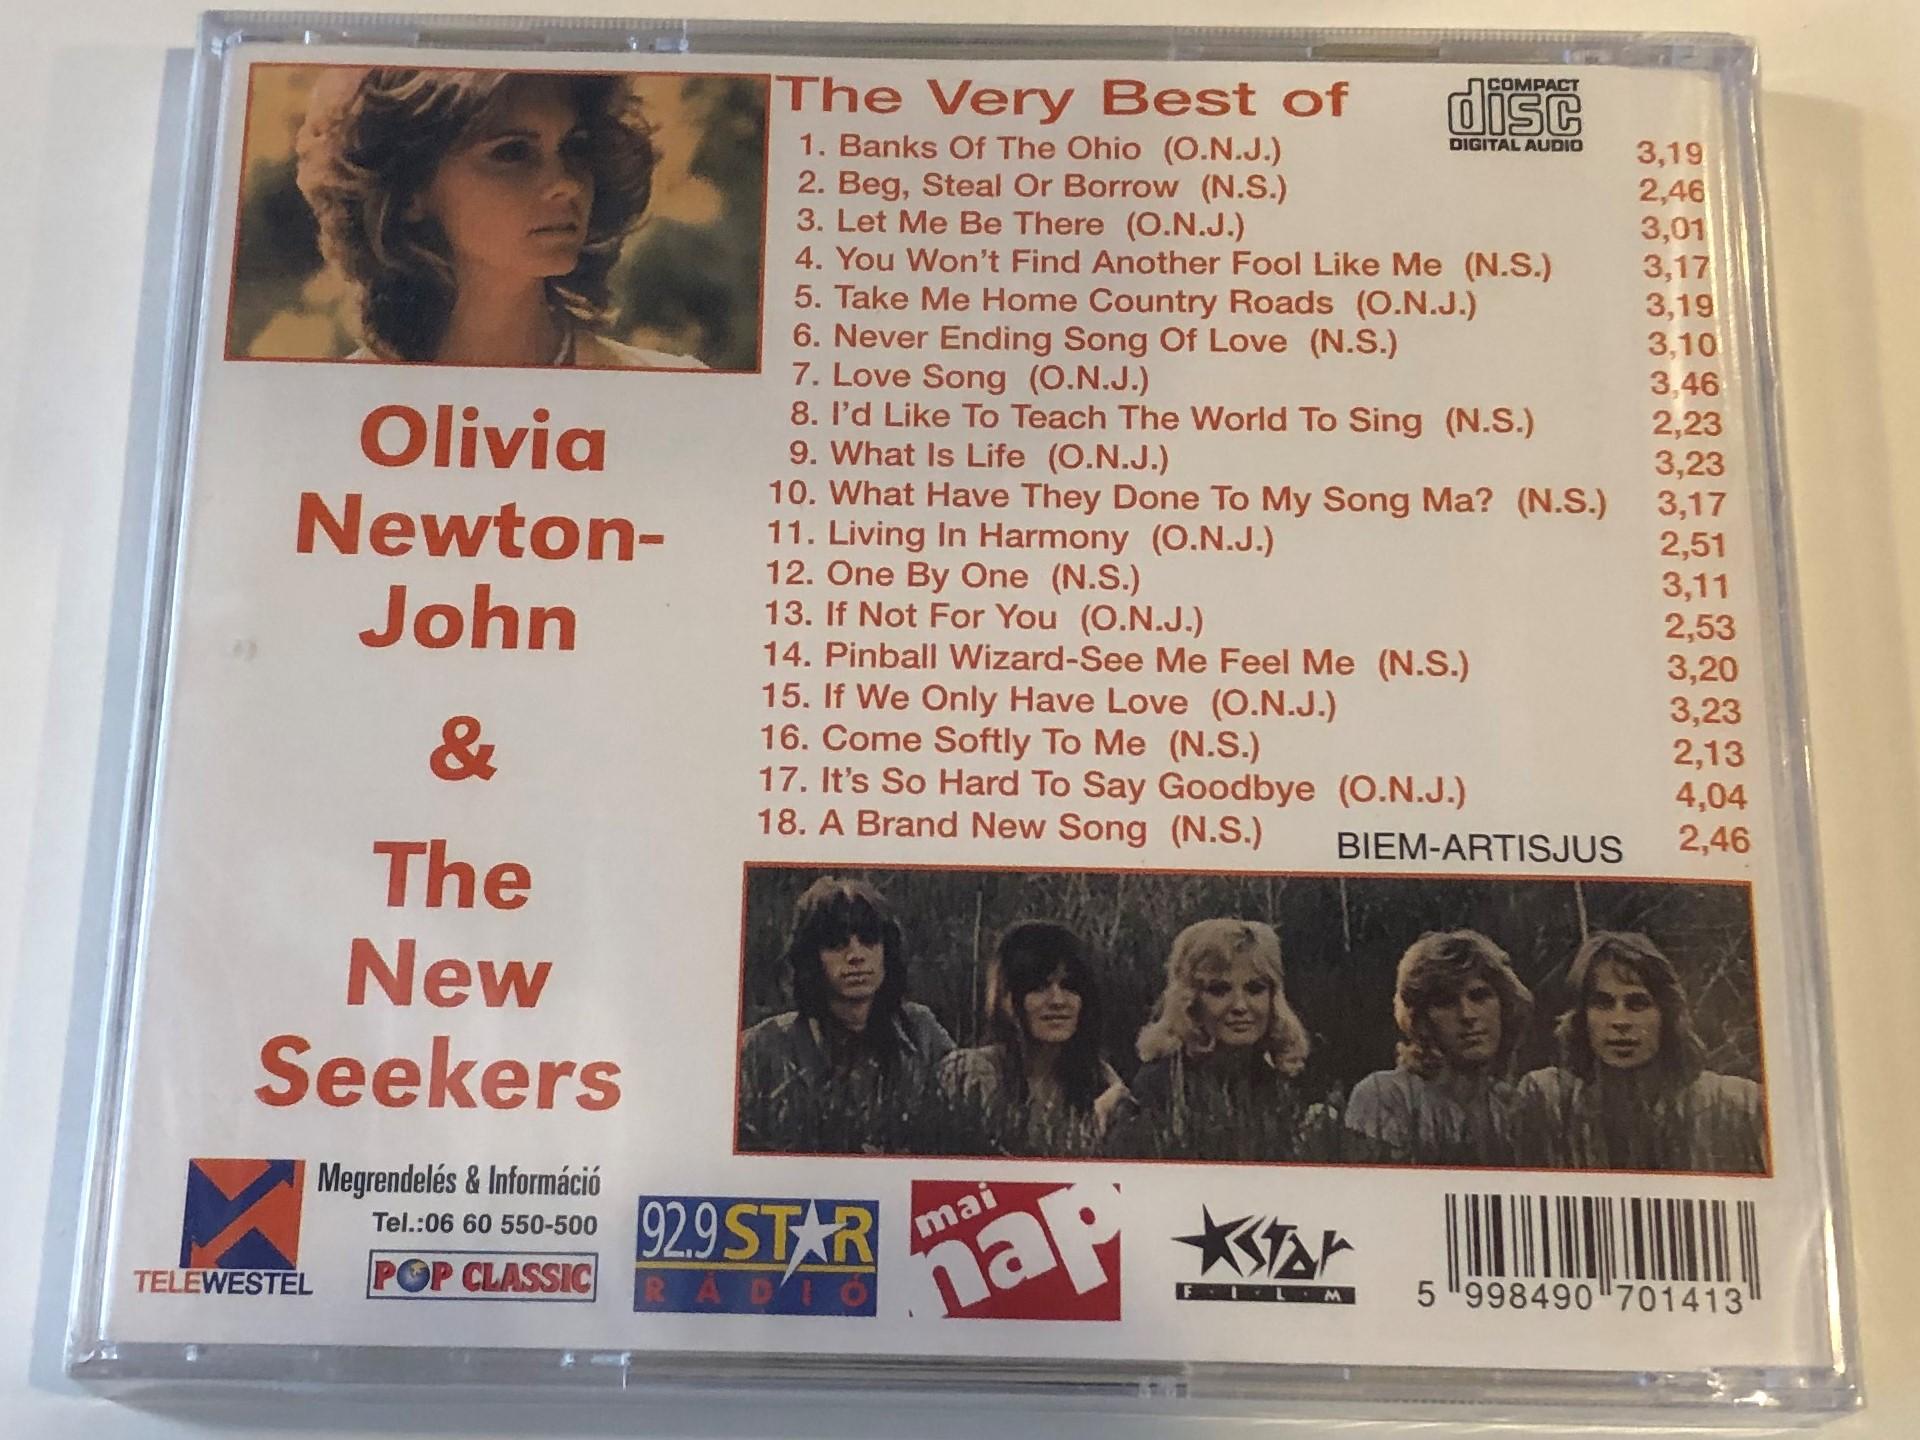 the-very-best-of-olivia-newton-john-the-new-seekers-pop-classic-audio-cd-5998490701413-2-.jpg